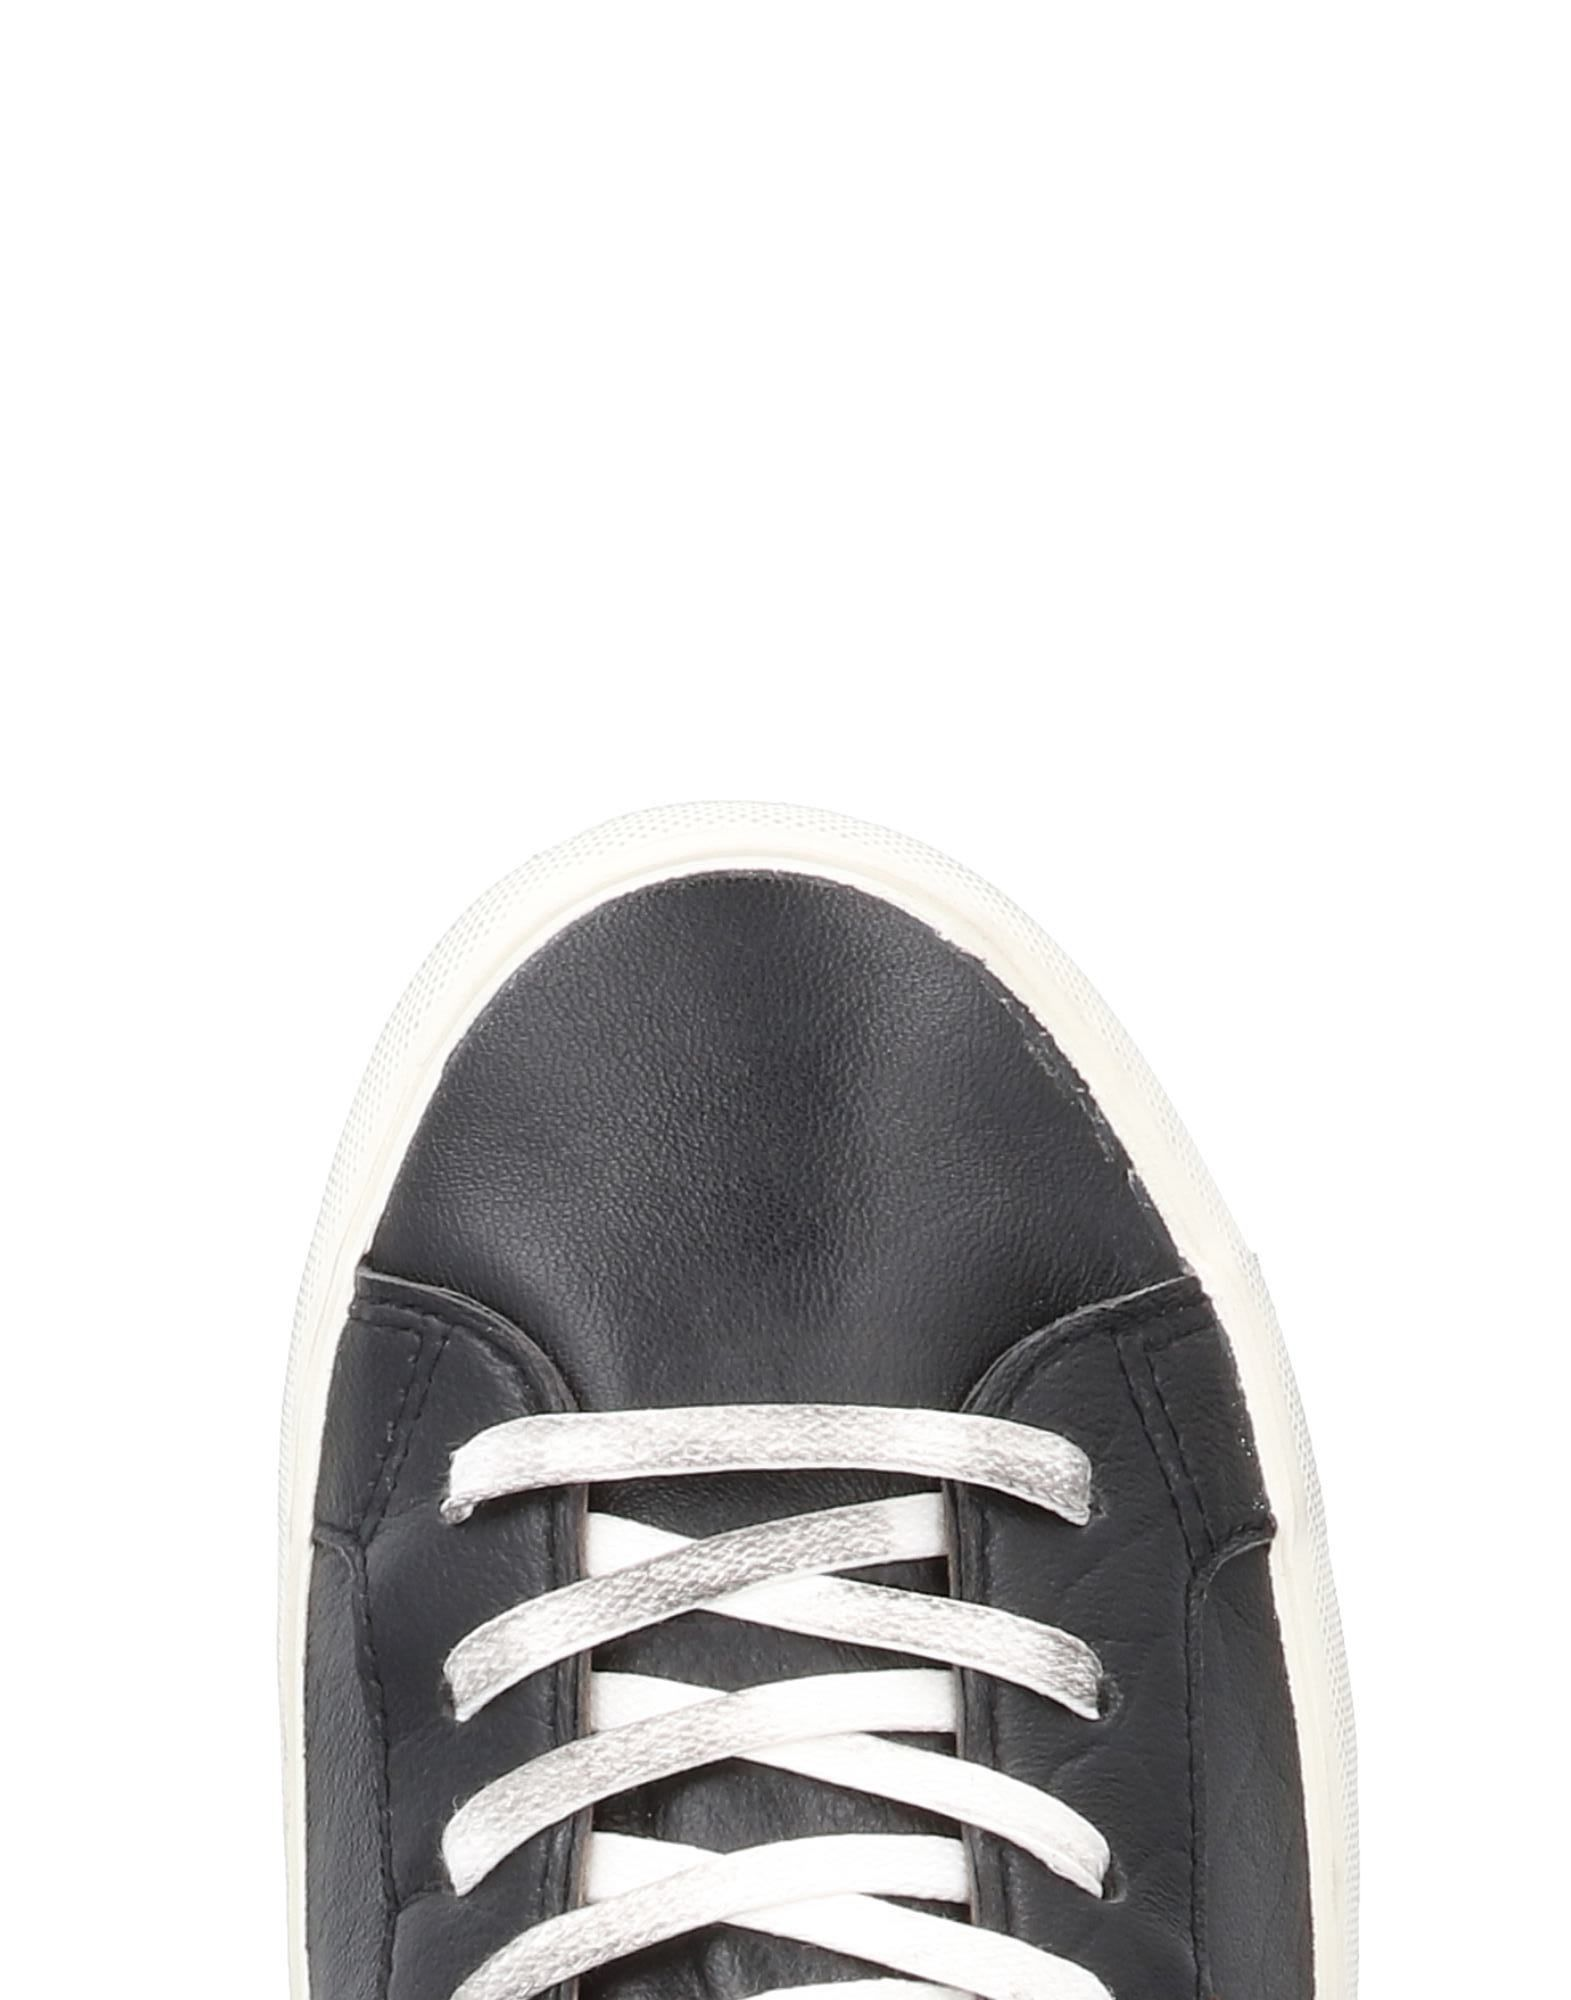 D.A.T.E. Sneakers Herren  11482438UR Heiße Schuhe 3d9c9f